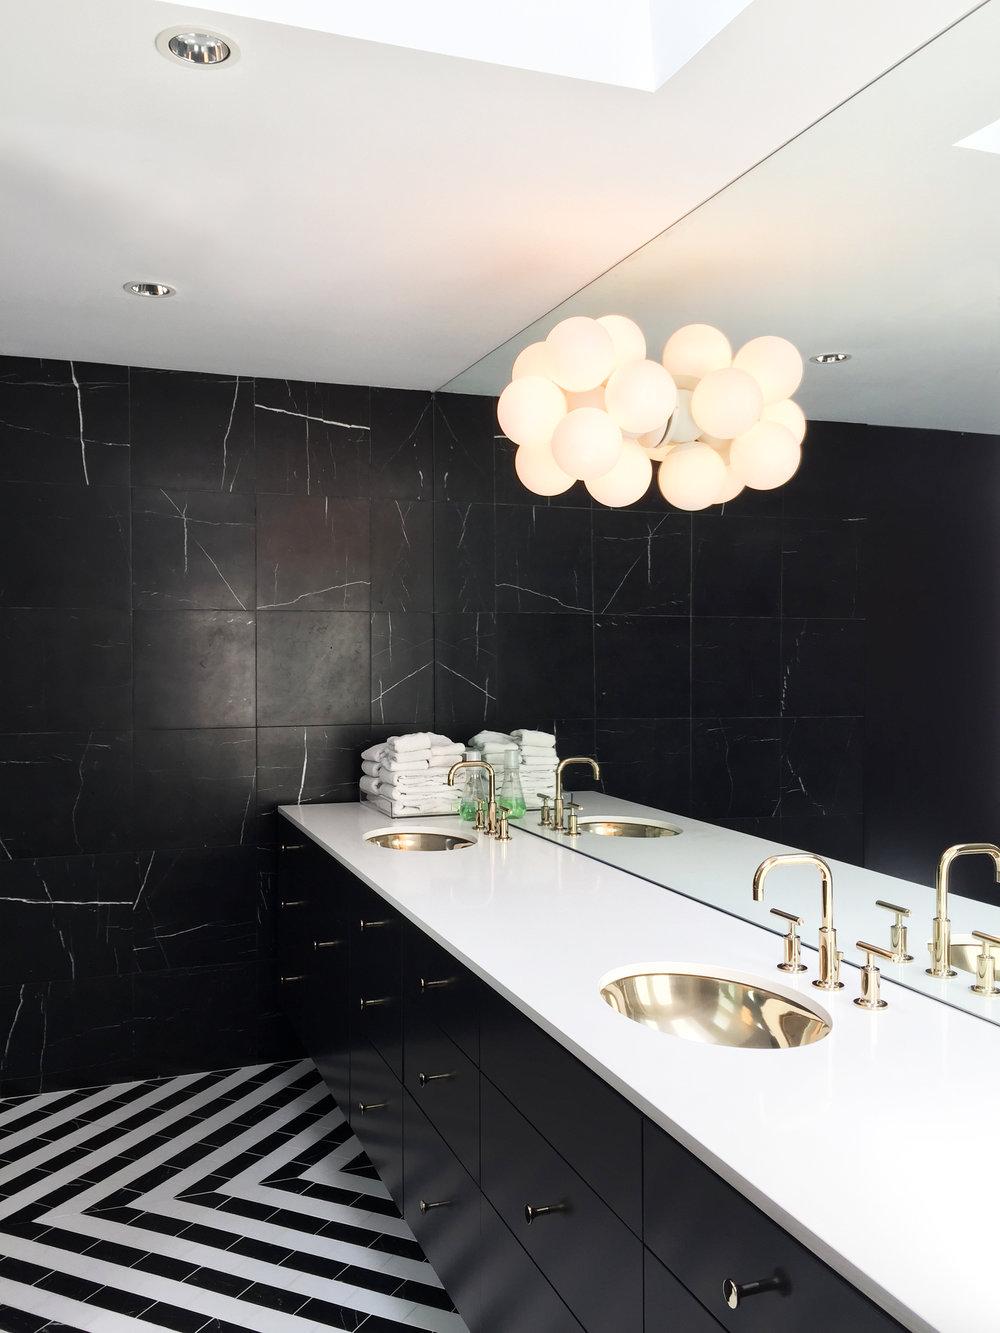 03 Binary Bathroom by Matt Fajkus Architecture.jpg